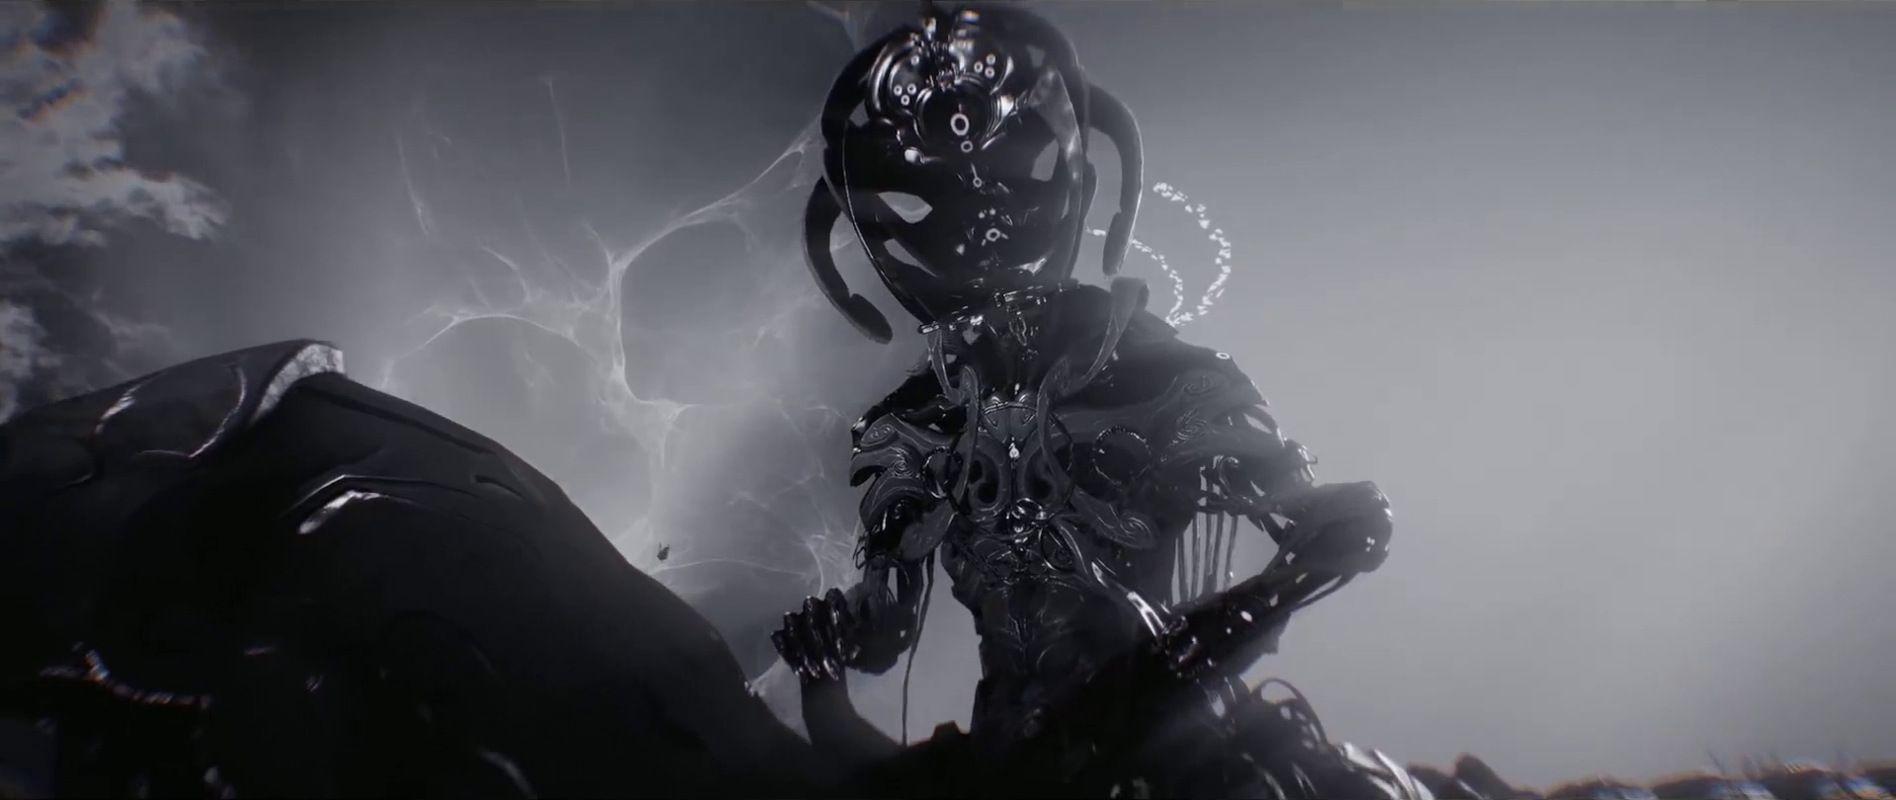 Warframe reveal that made TennoCon go,